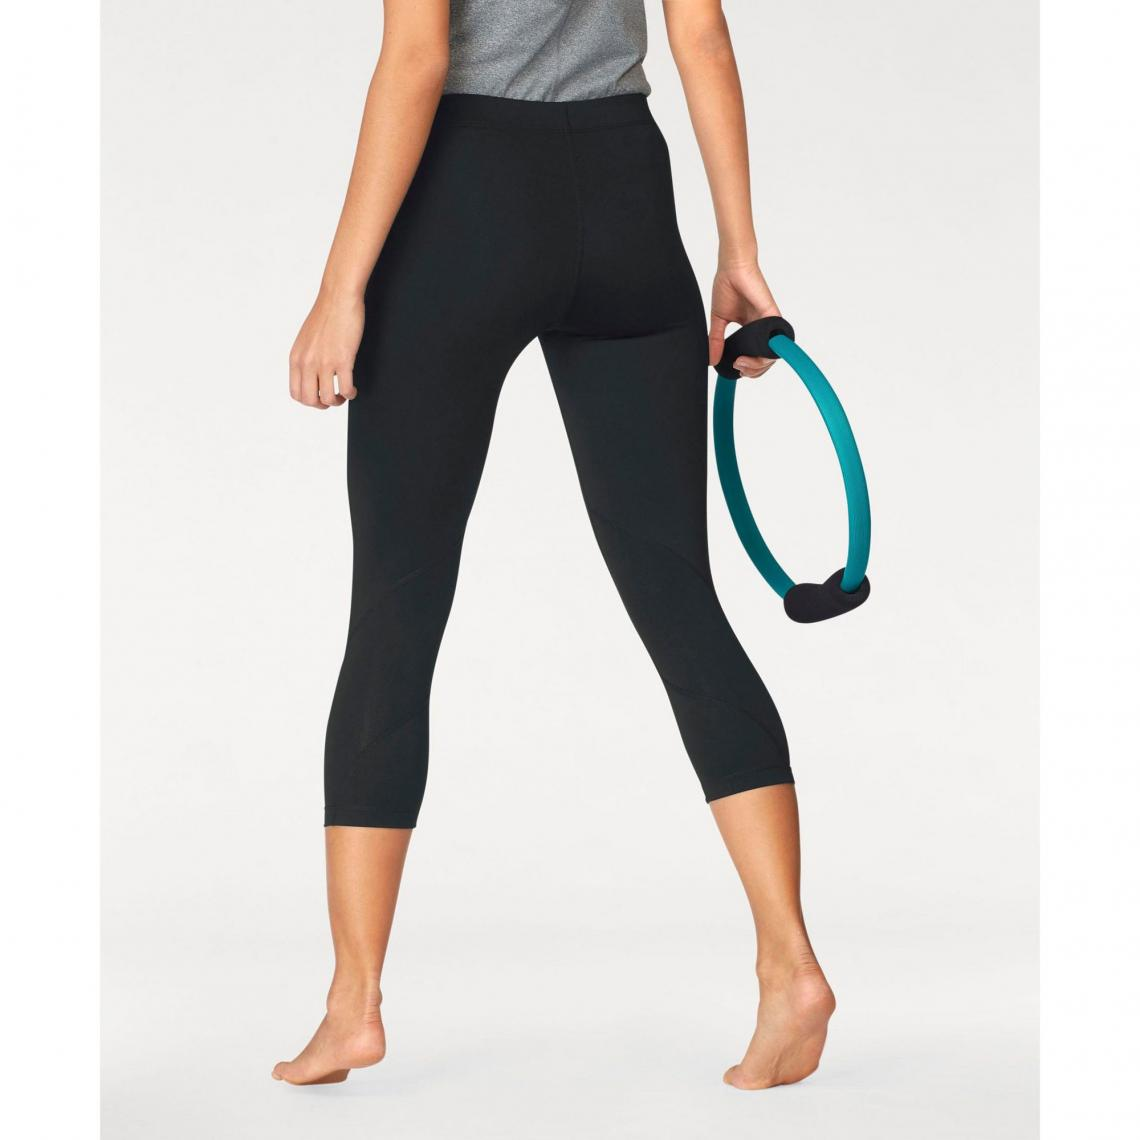 Collant de training 7 8 femme Nike Pro - Noir  addd66f83f1